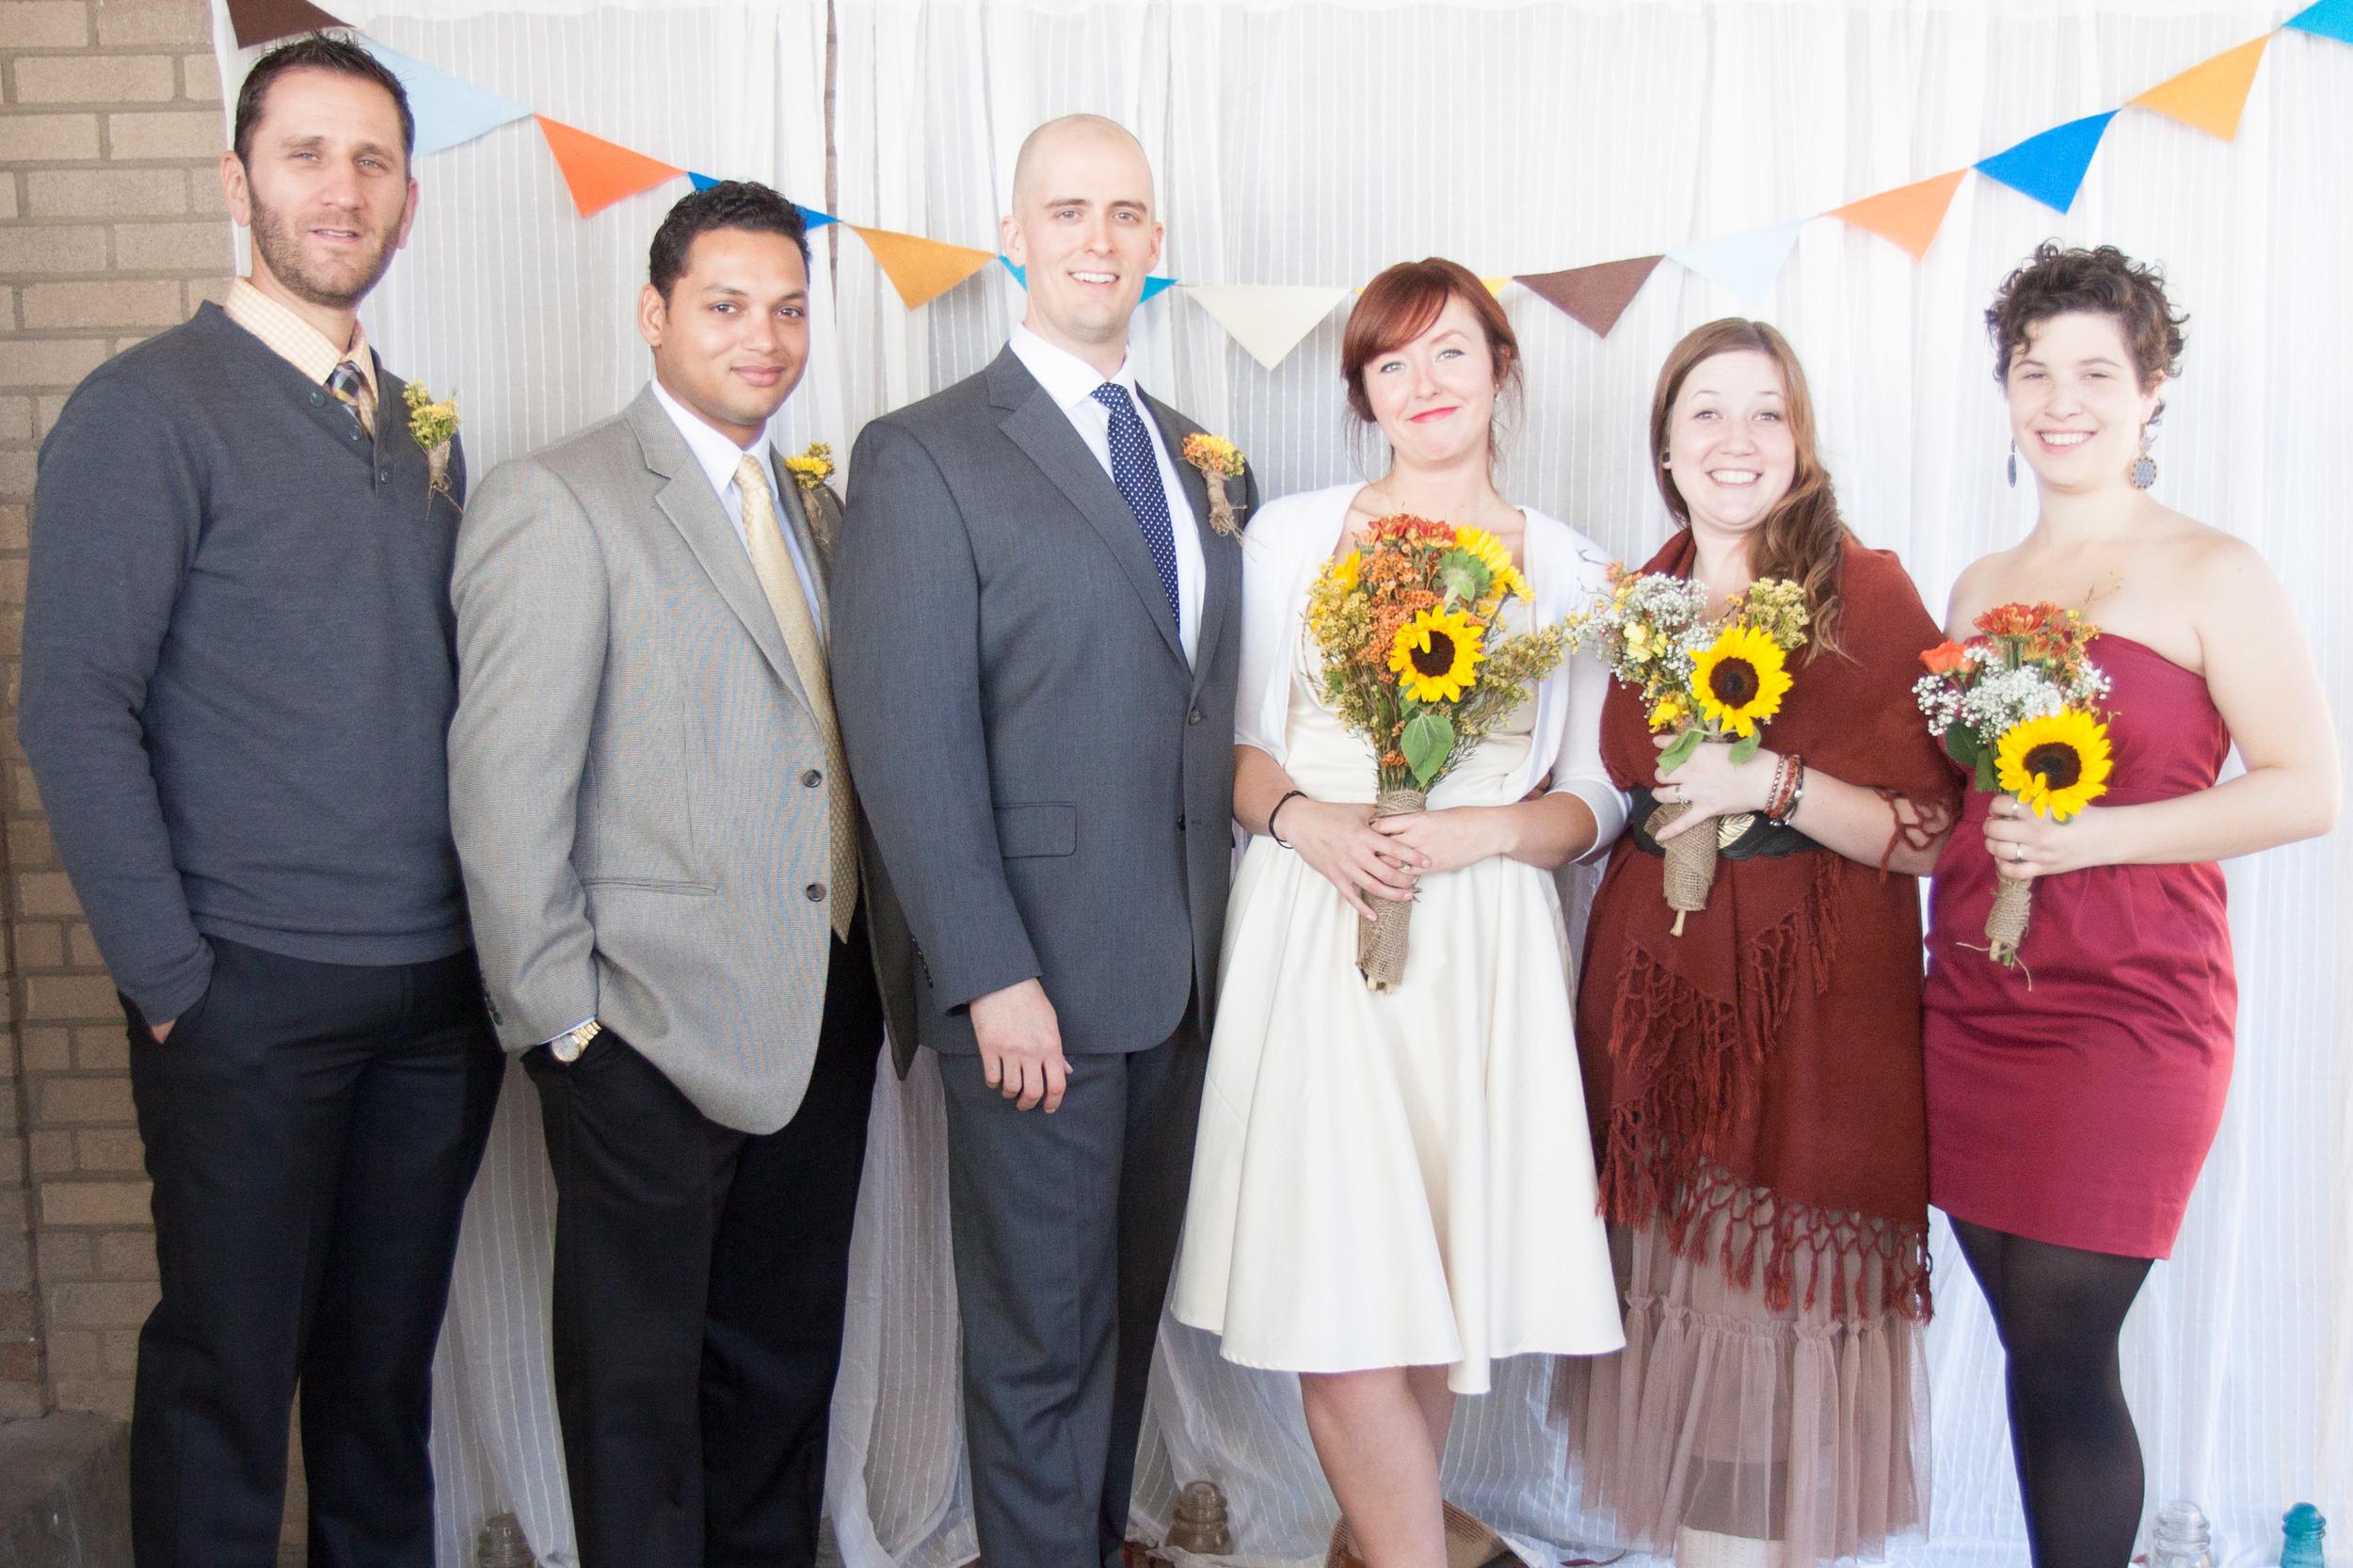 Wilson Bickel Wedding - Family Photos (5 of 25).jpg